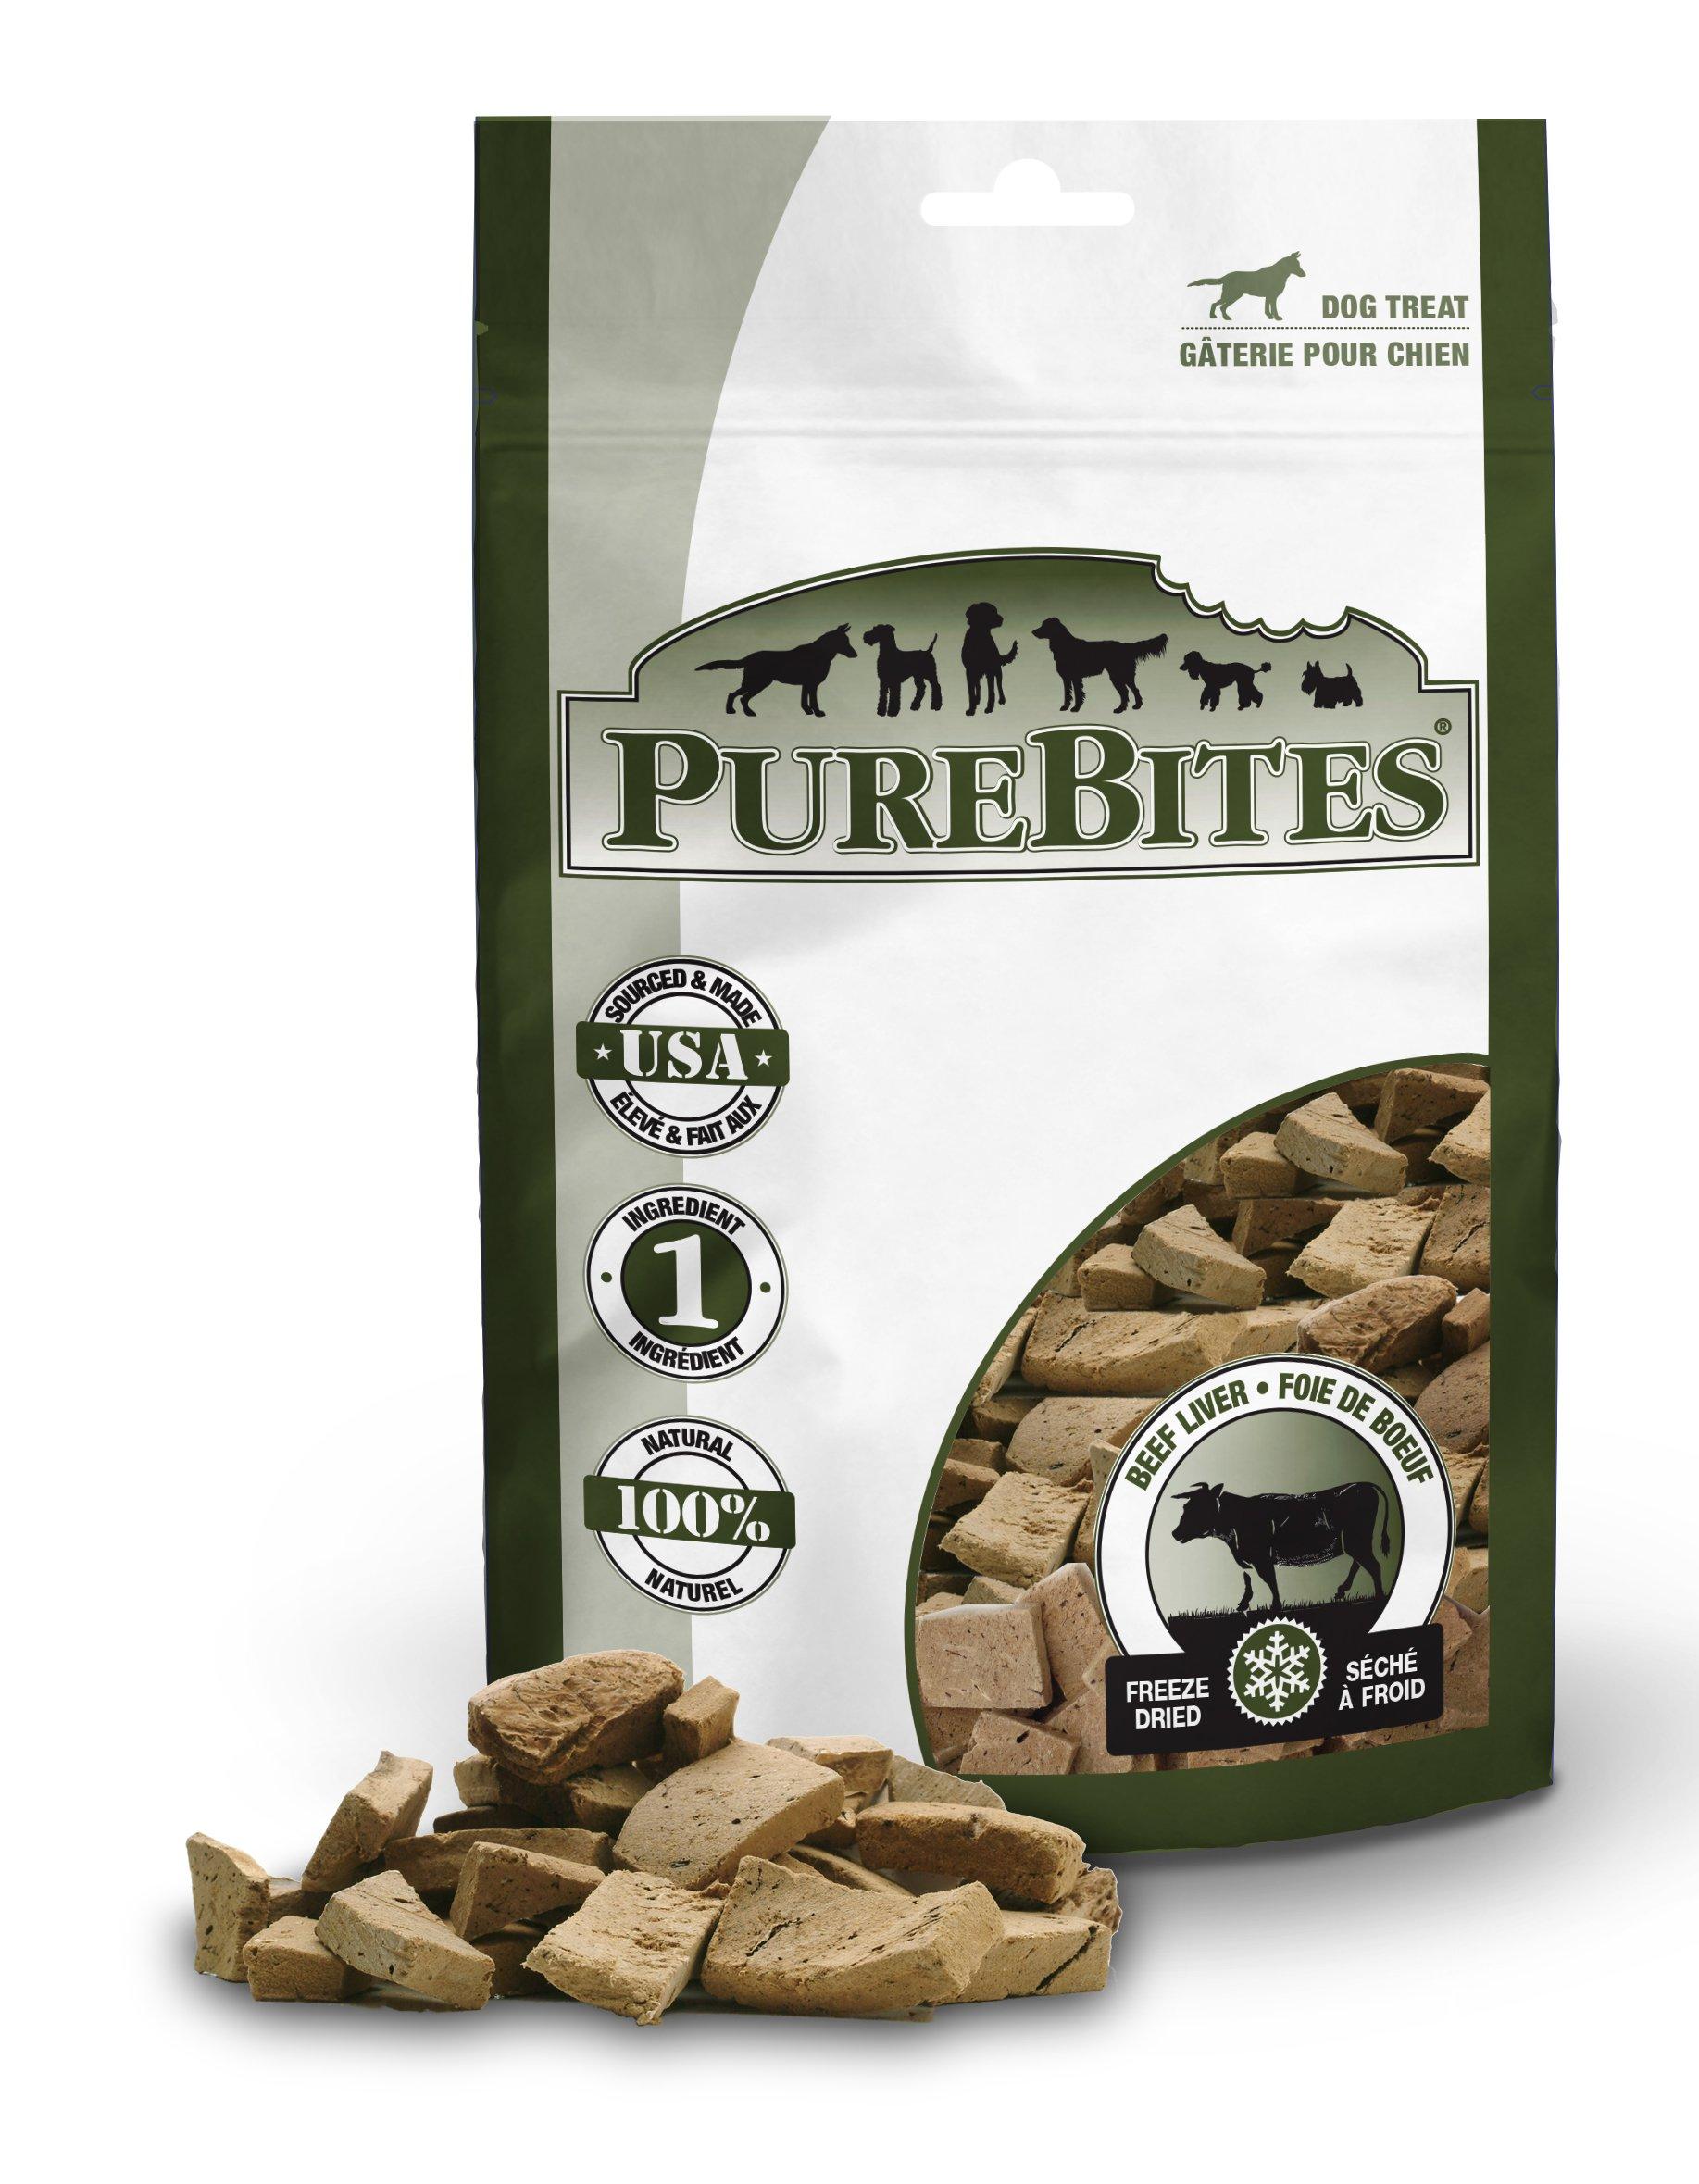 PureBites Beef Liver for Dogs, 16.6oz/470g - Super Value Size